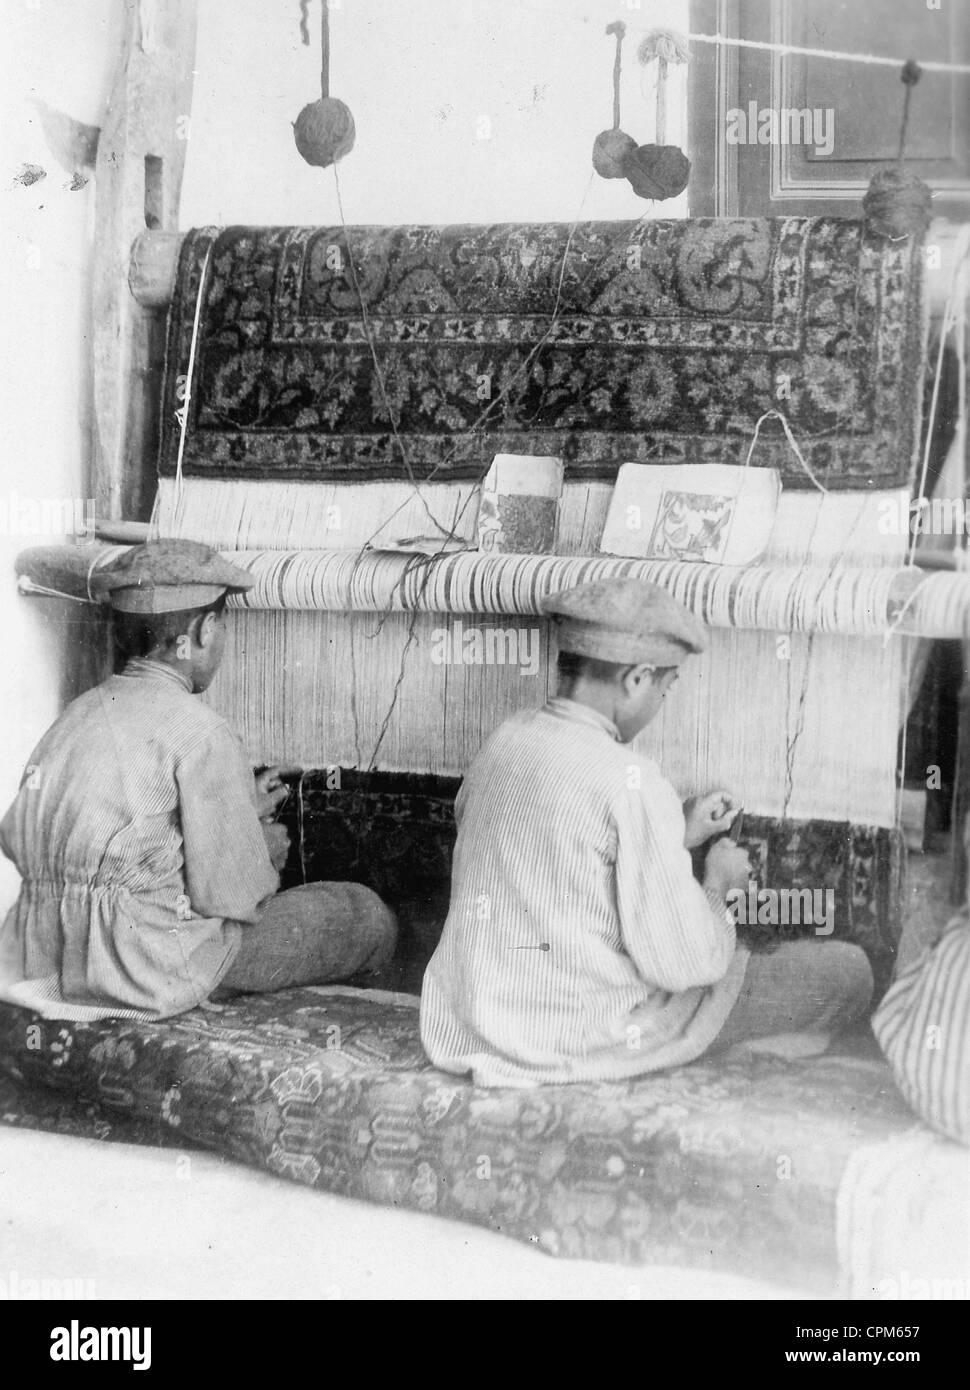 Rug weaving in Iran, 1928 - Stock Image